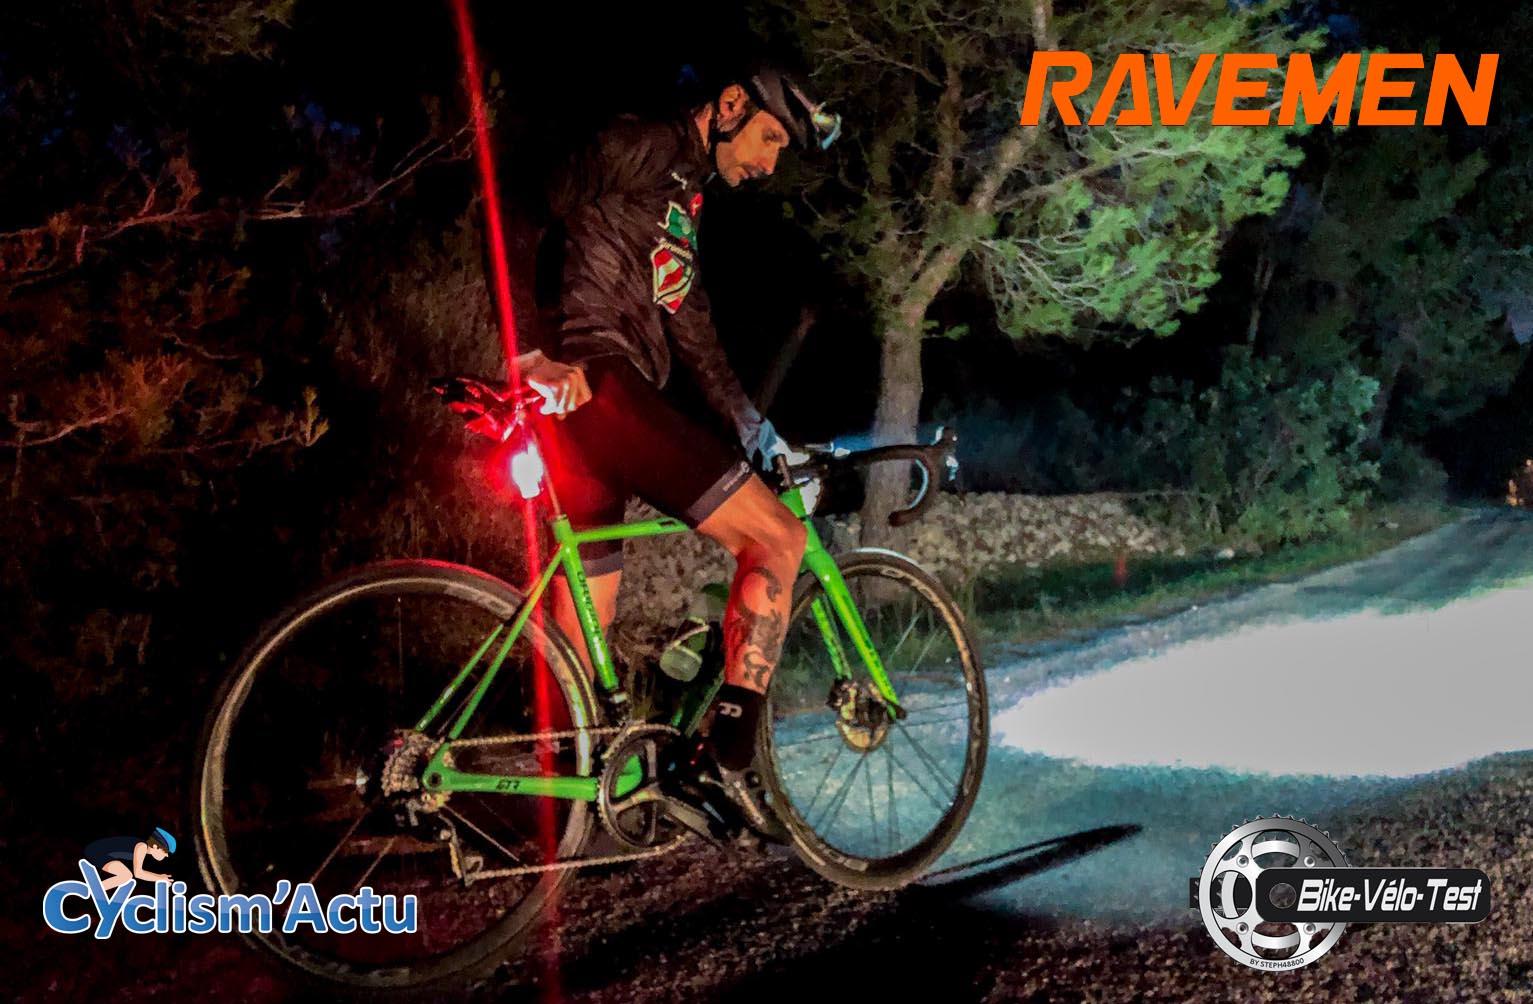 Bike Vélo Test - Cyclism'Actu a testé : les phares Ravemen